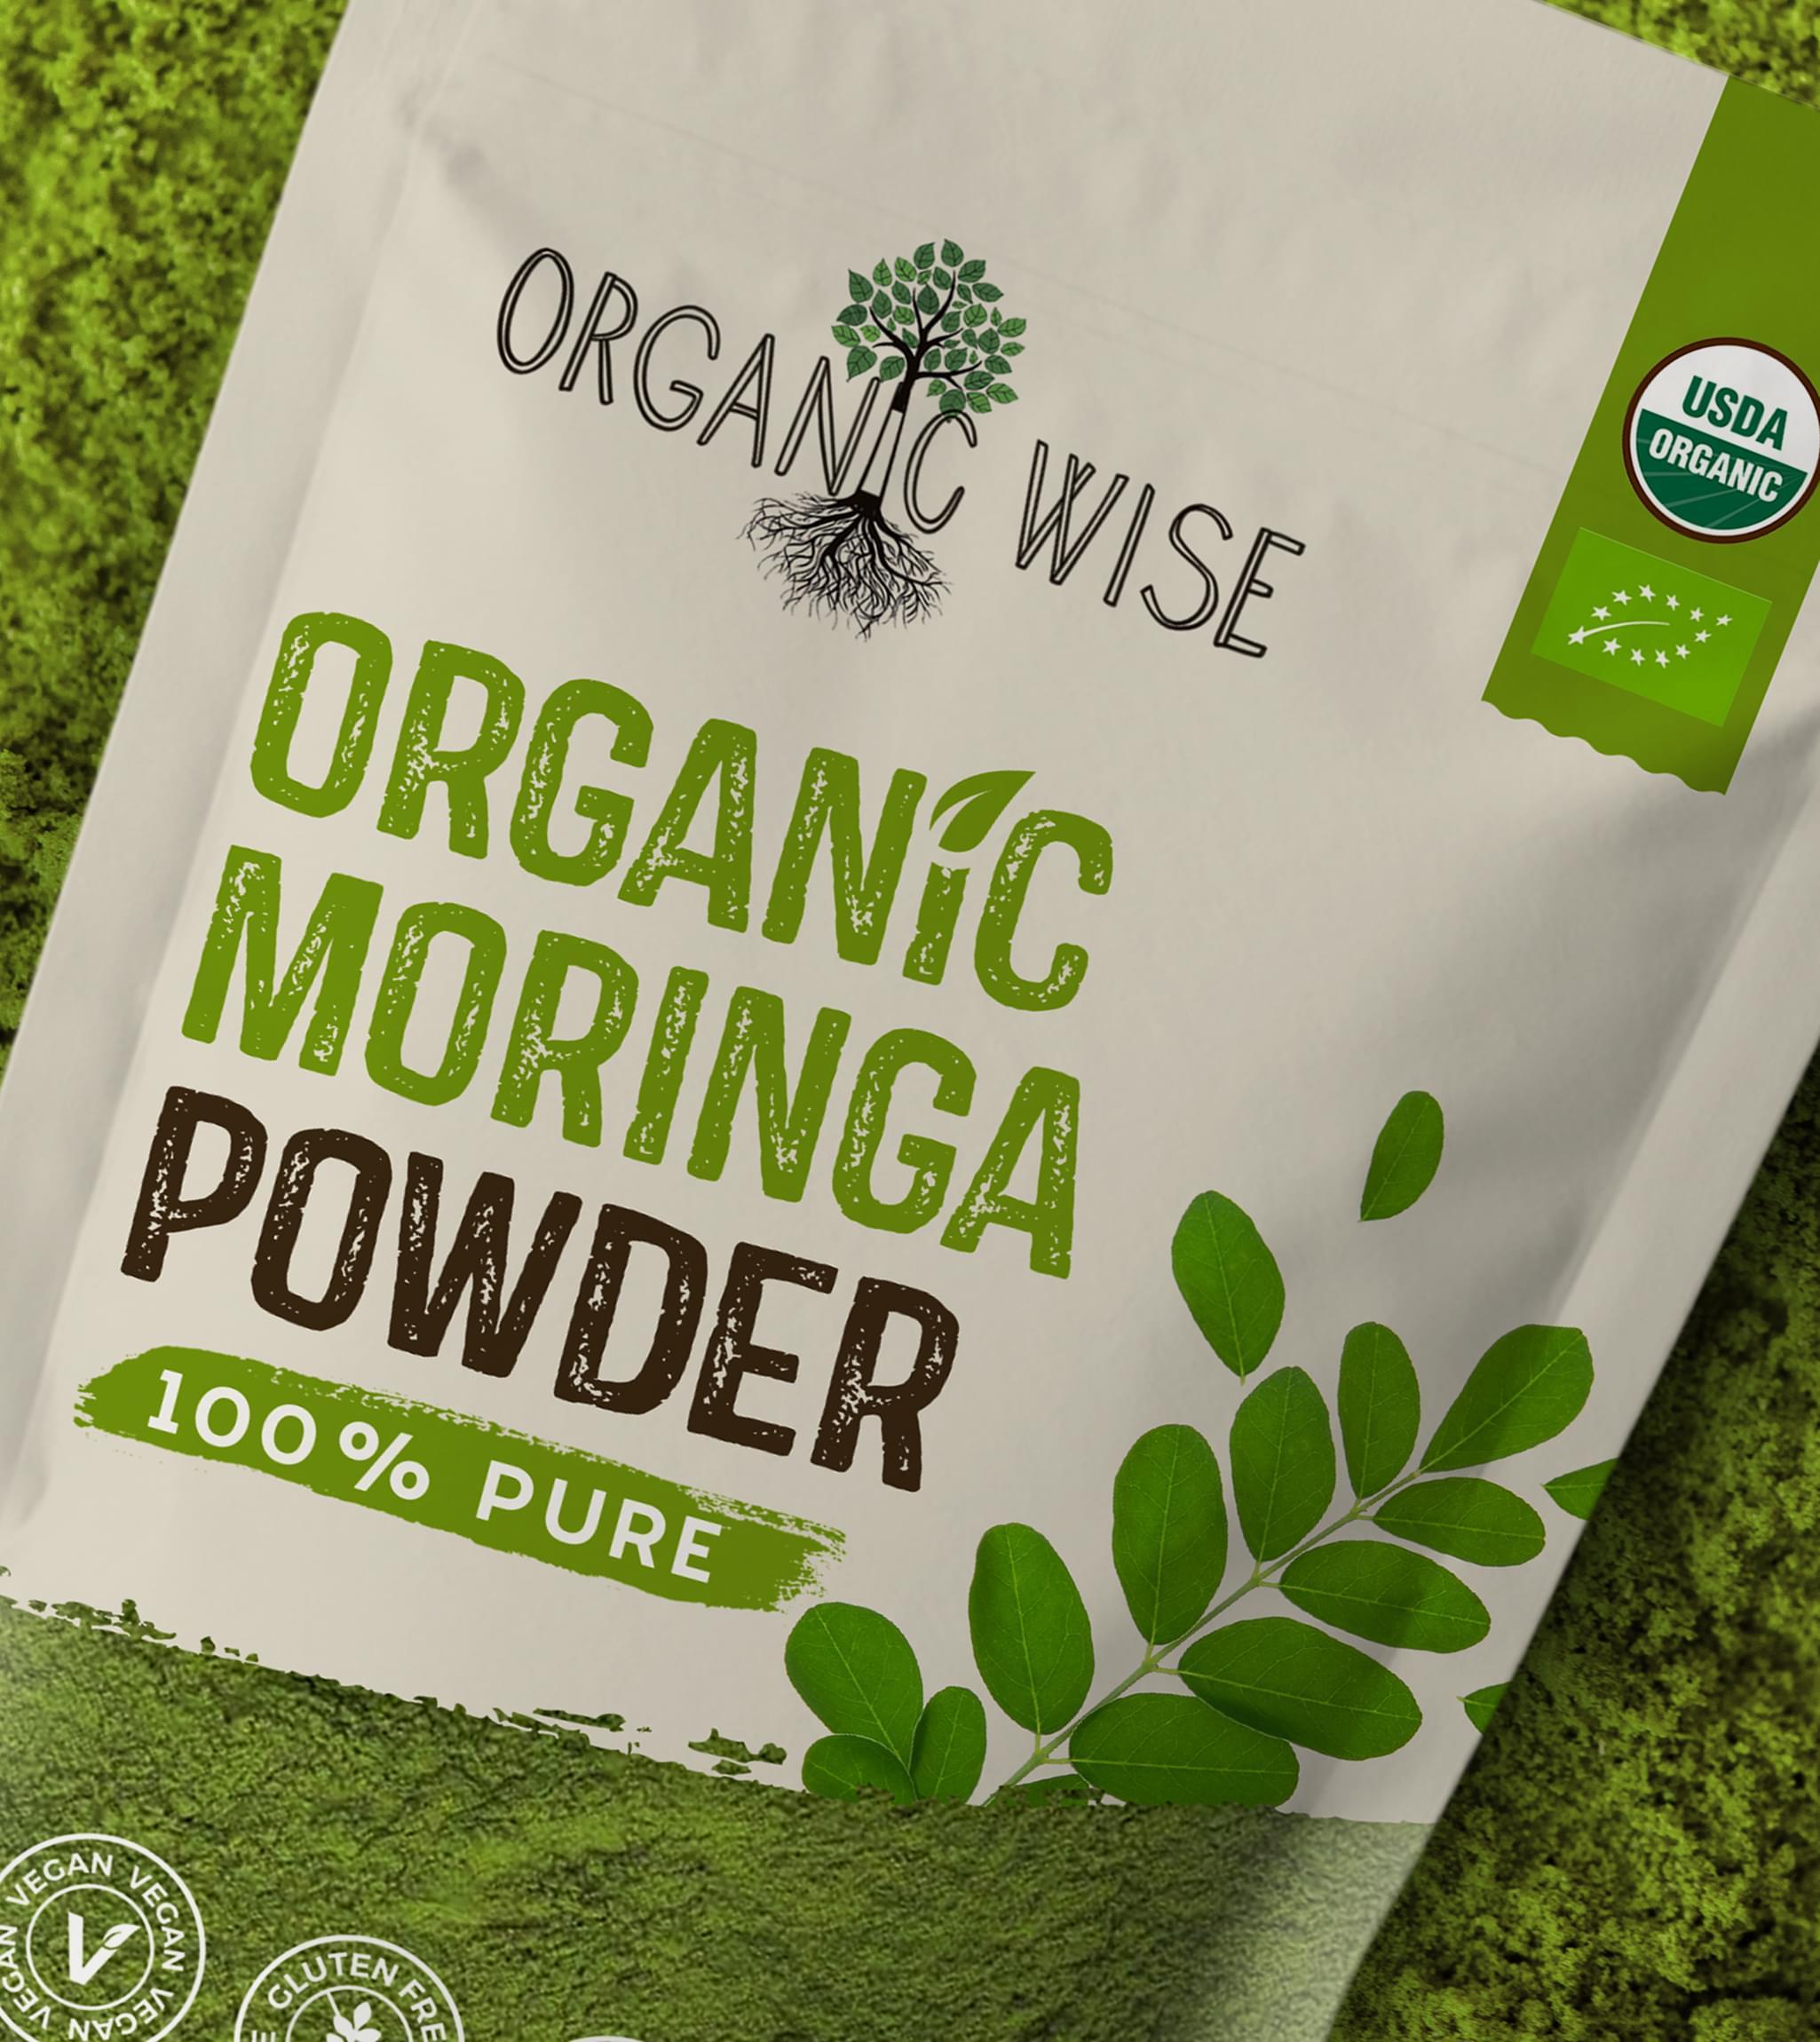 ORGANIC WISE Packaging